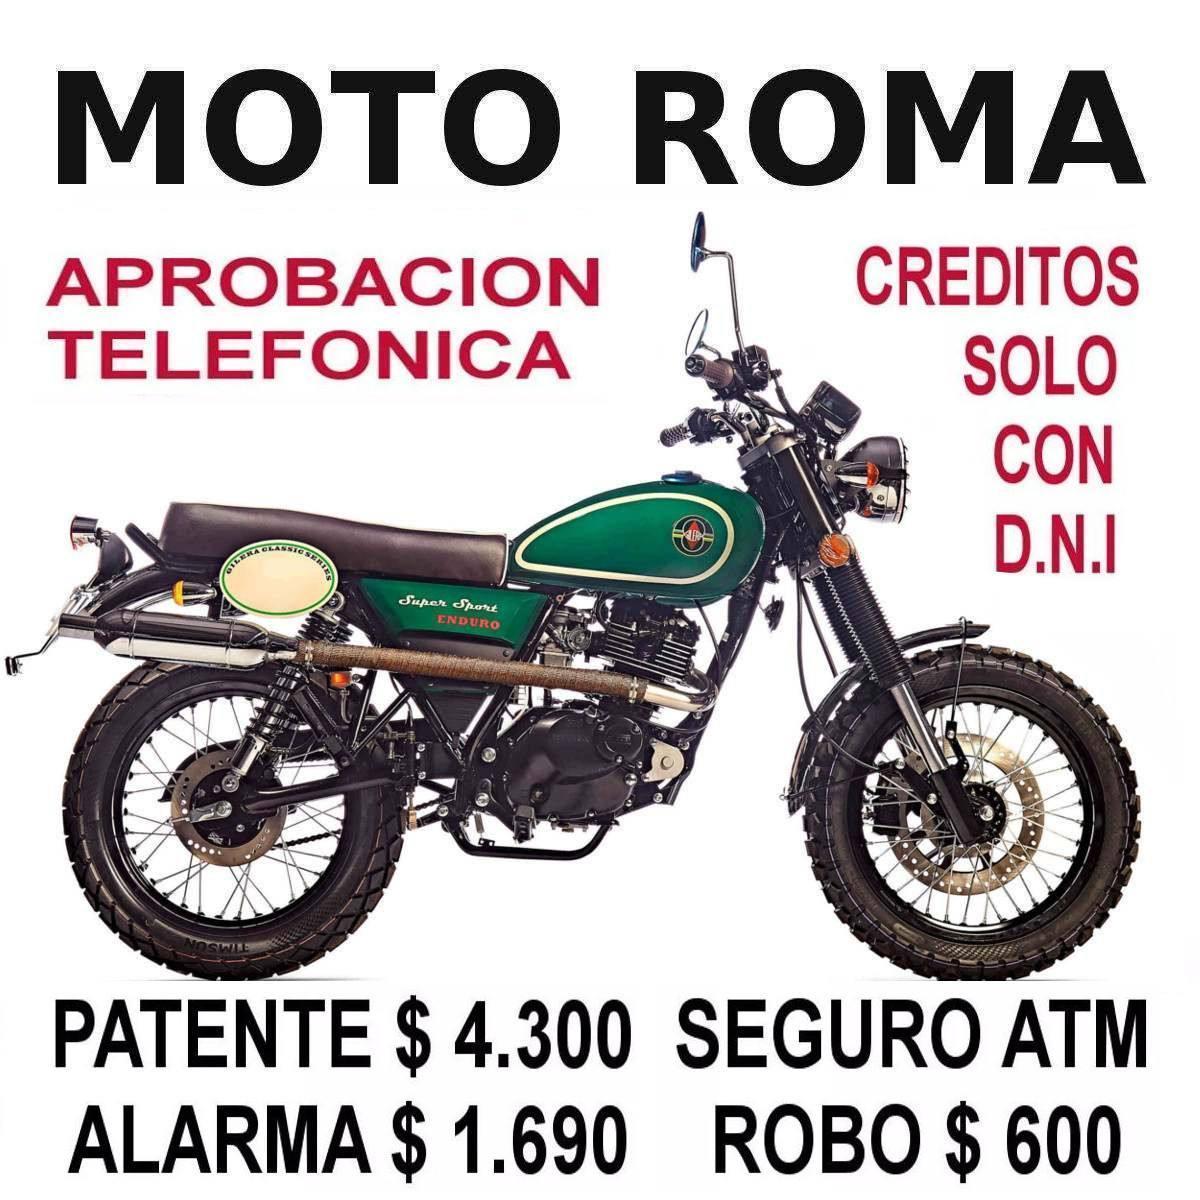 Gilera Cafe Racer Enduro Patente $4.300